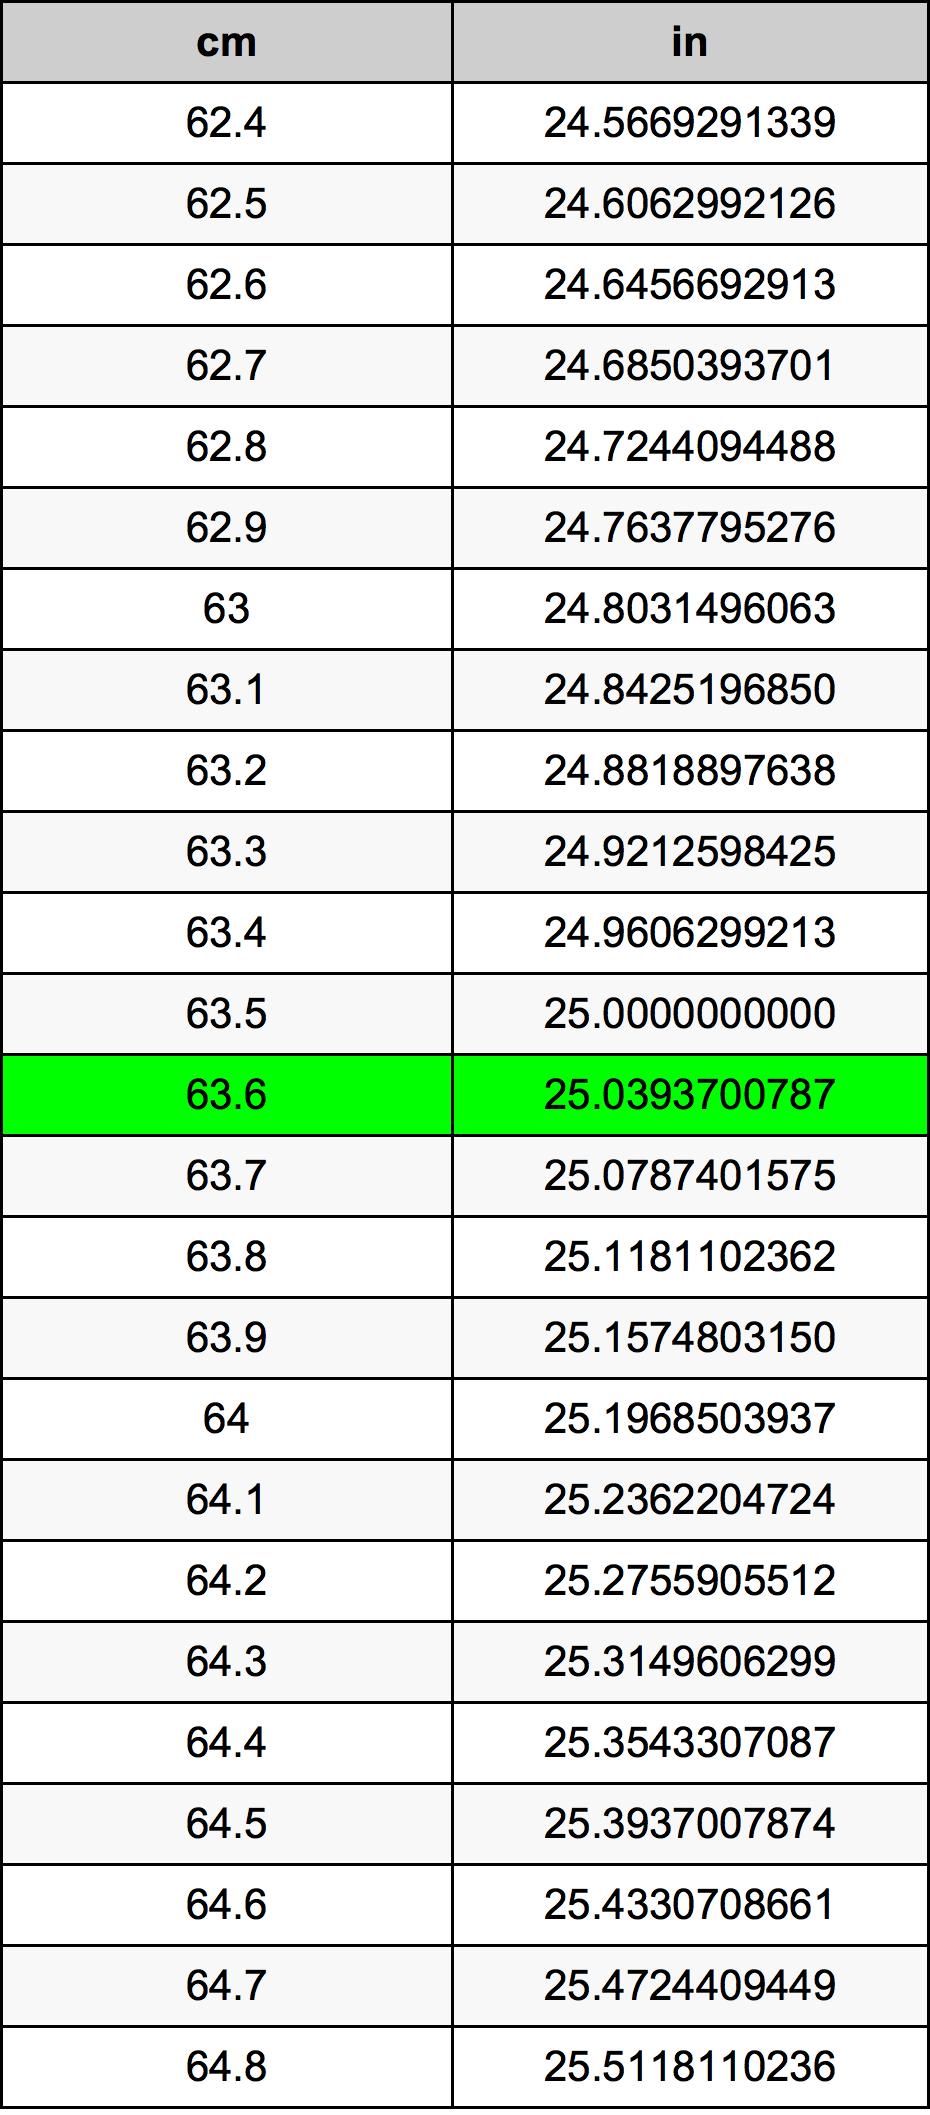 63.6 Centimeter konverteringstabellen